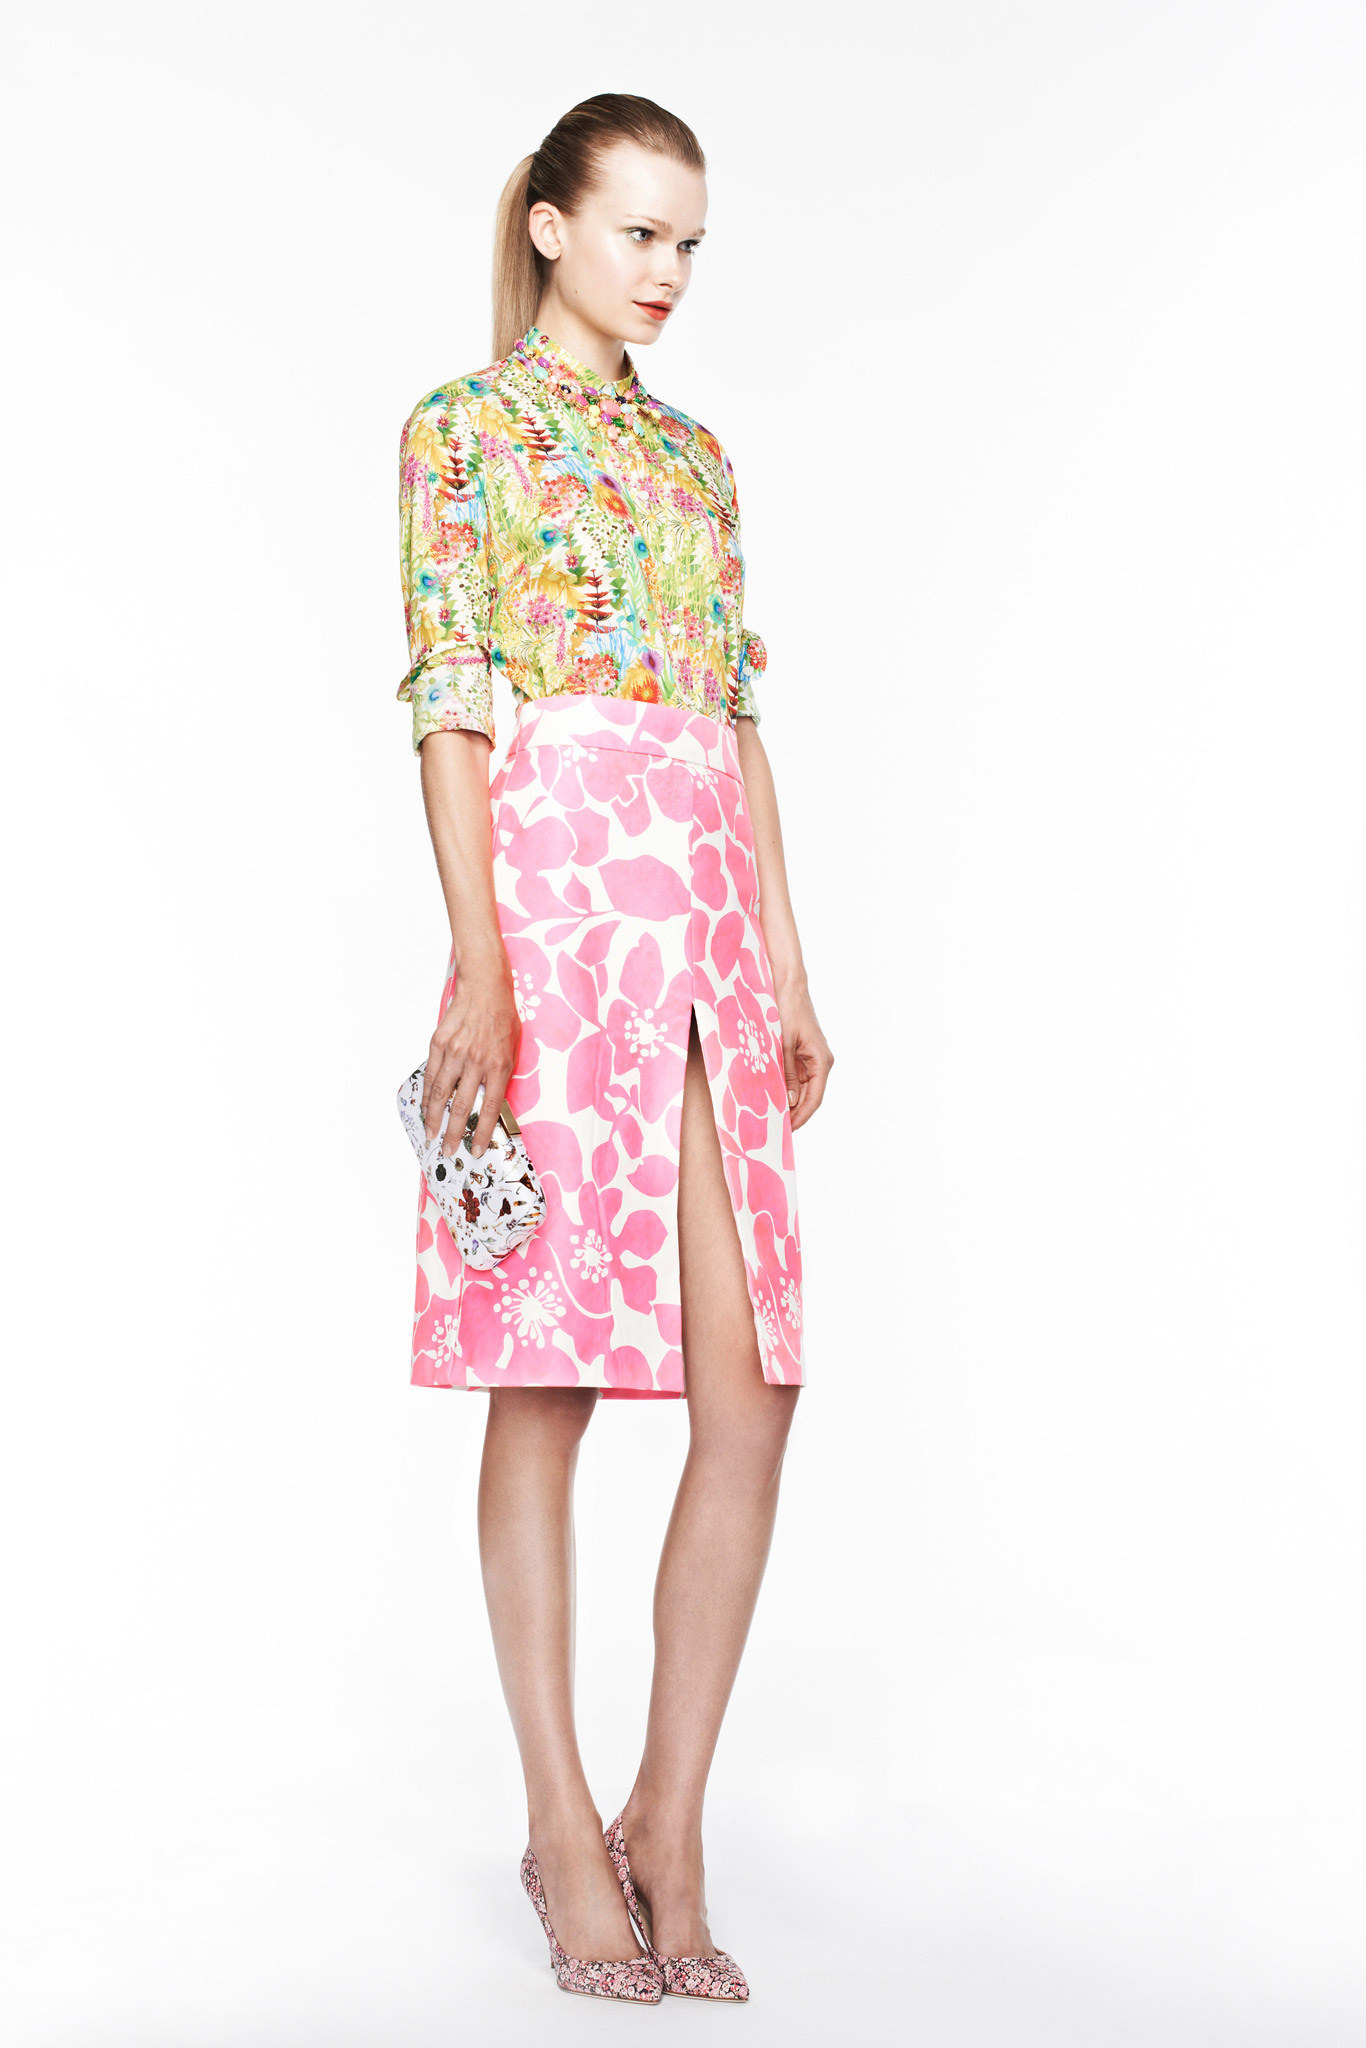 J. Crew Spring 2013 Collection New York Fashion Week